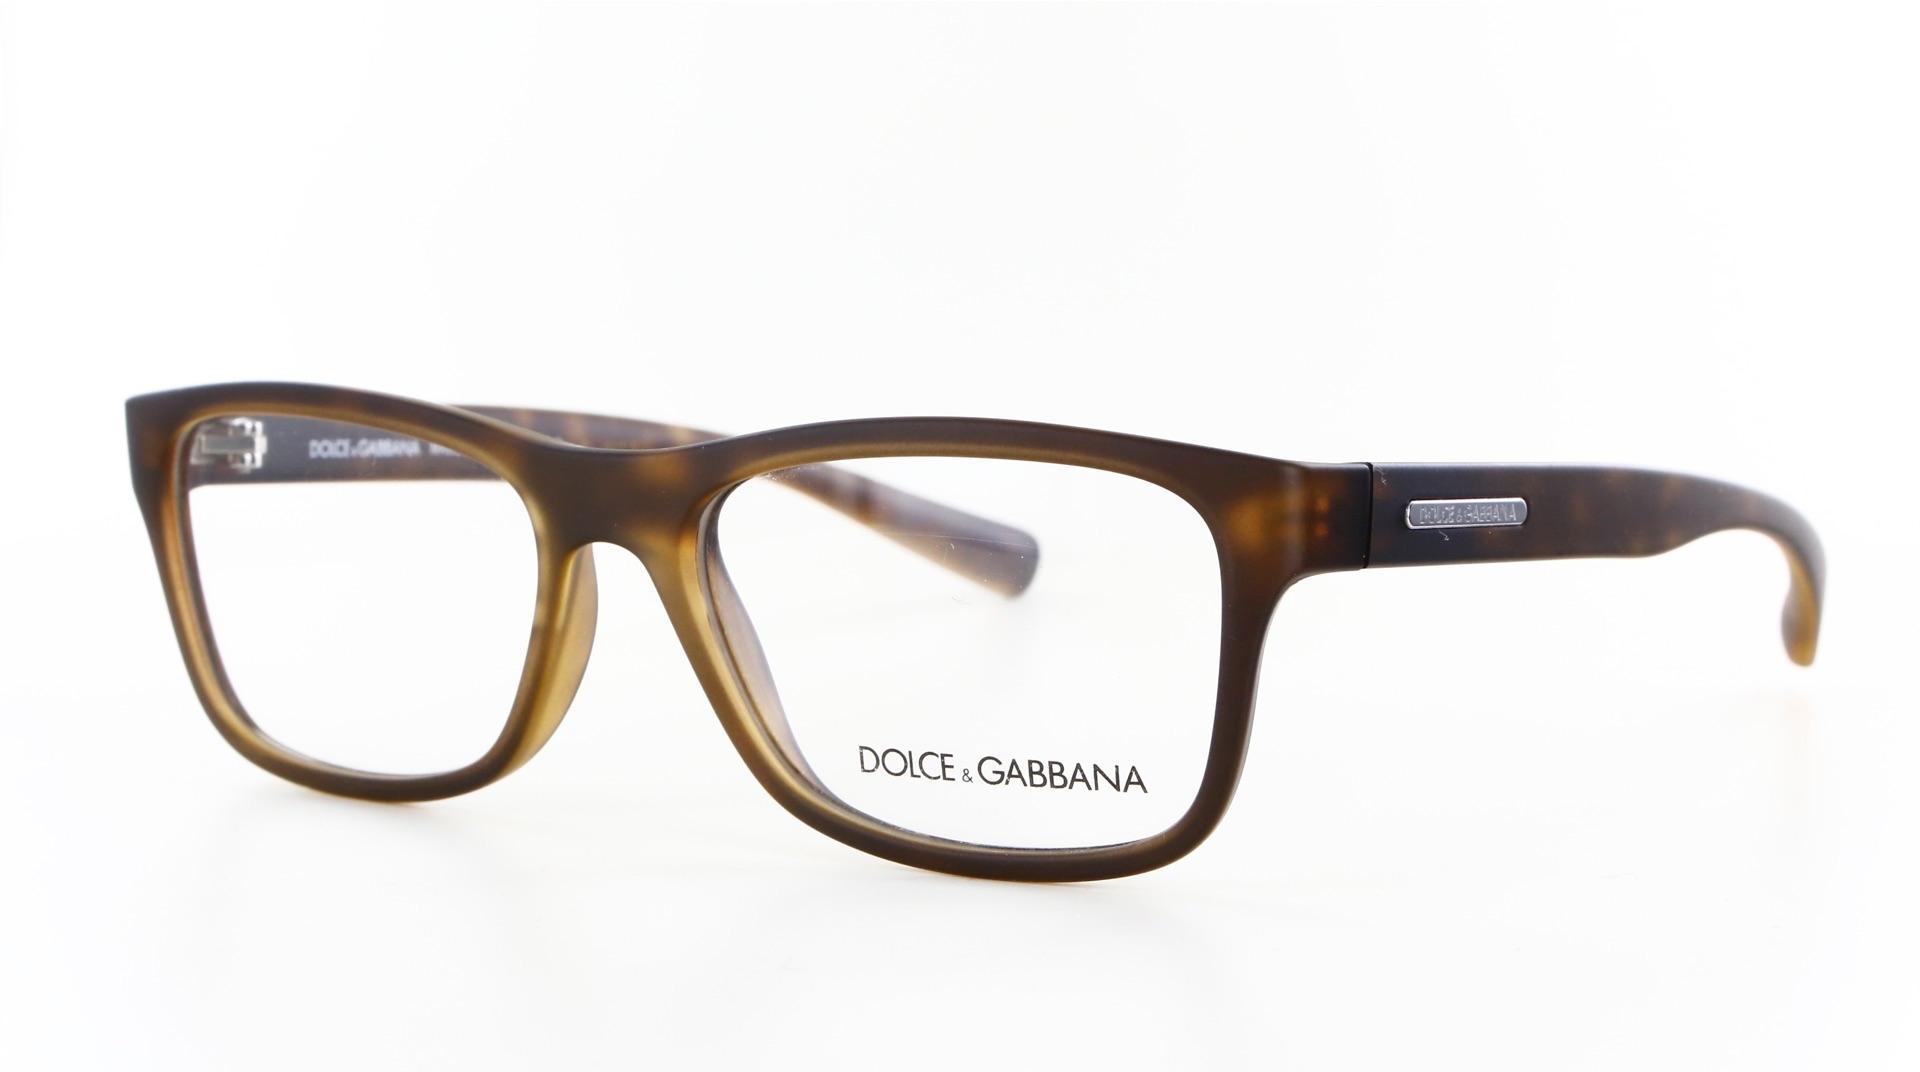 Dolce & Gabbana - ref: 71986